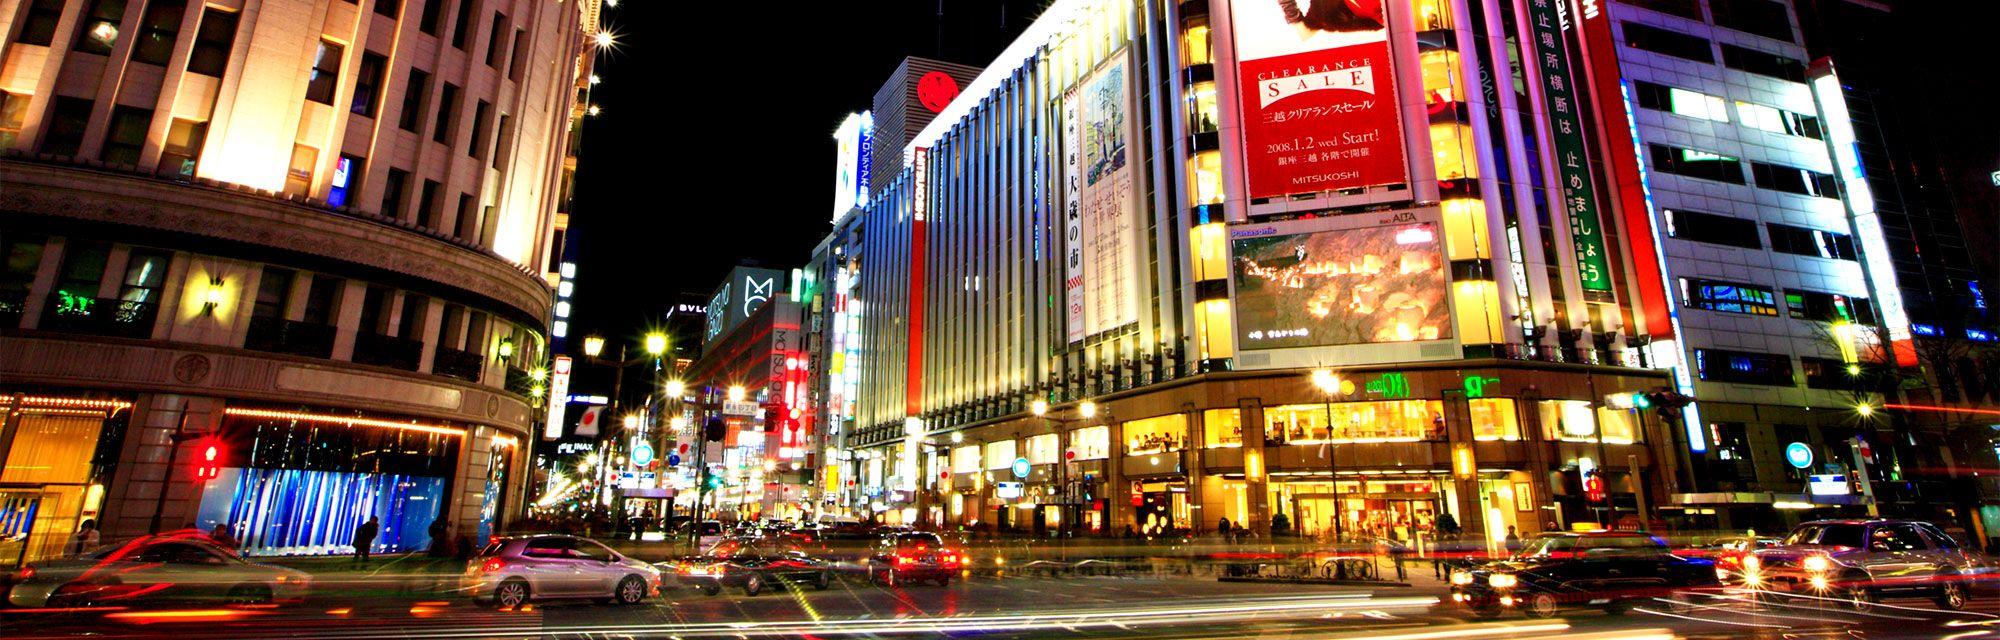 Ginza Area Perbelanjaan Mewah nan Elite di Tokyo